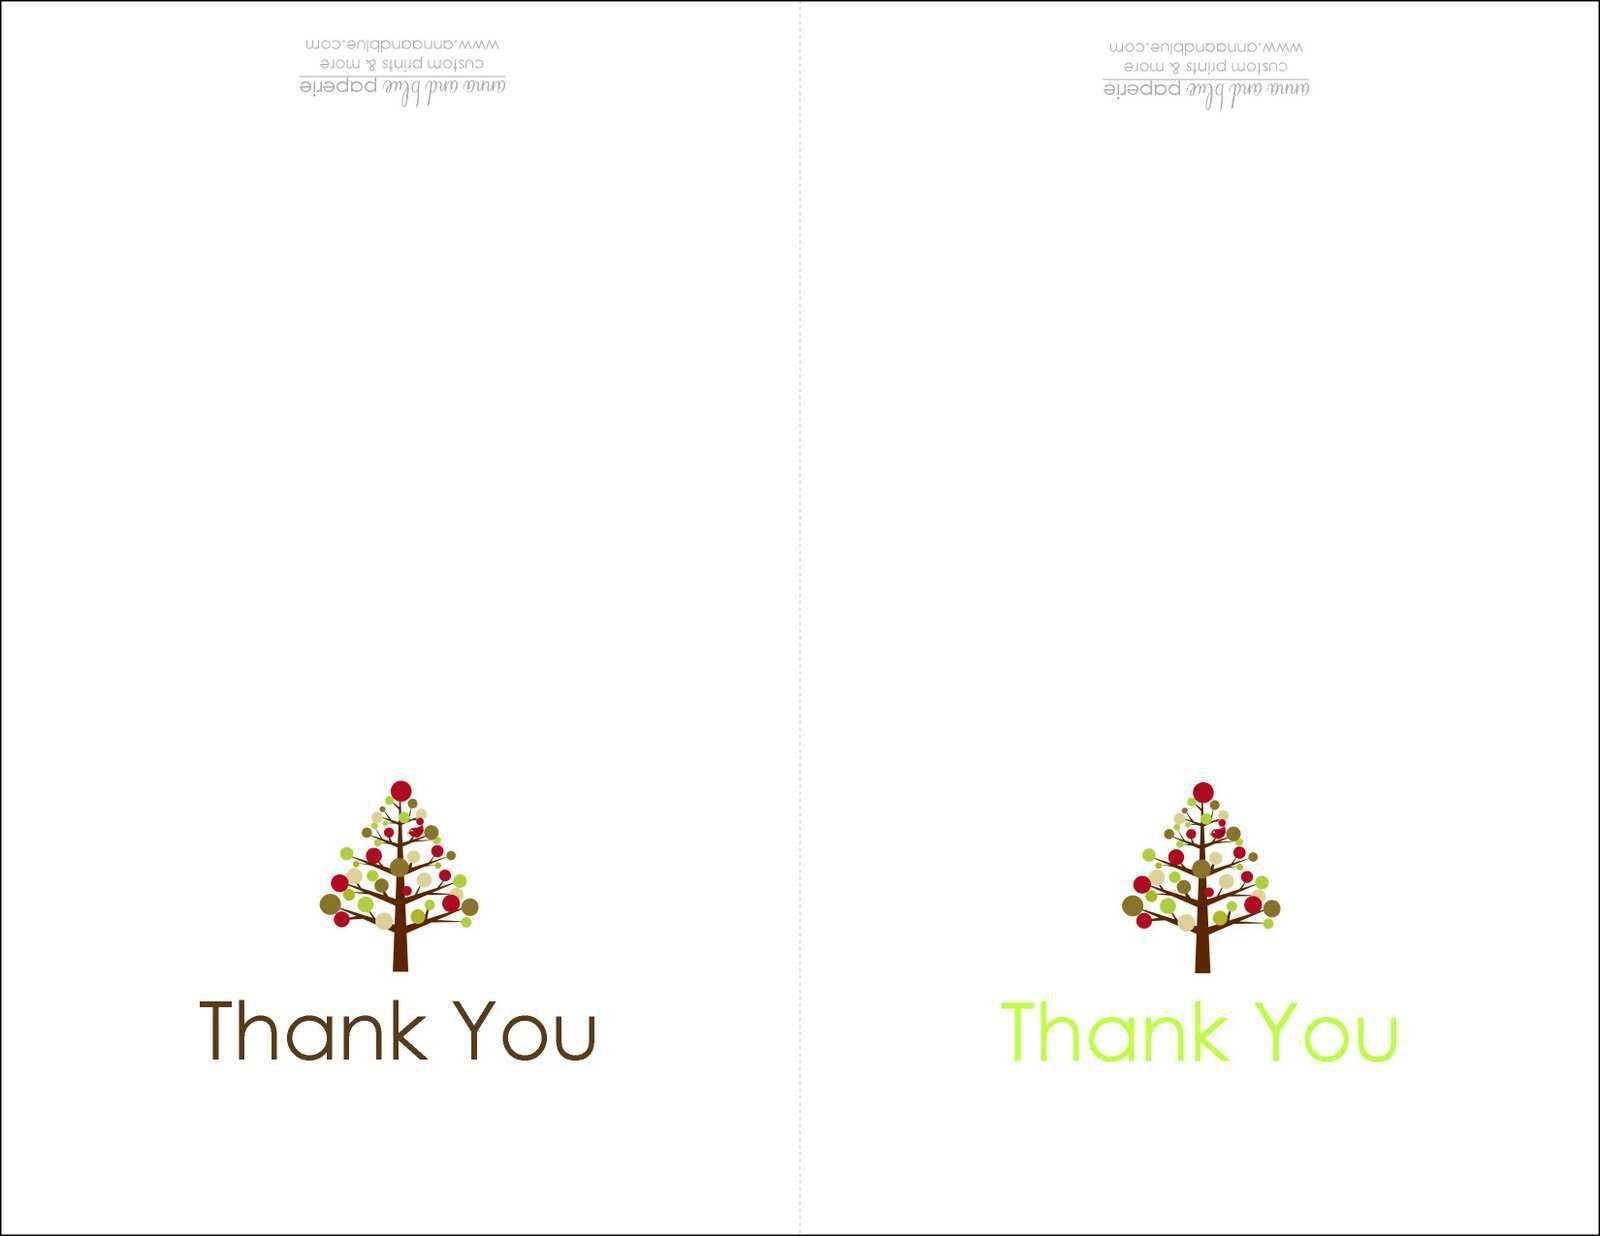 003 Stupendou Thank You Note Template Free Highest Clarity  Poshmark TeacherFull